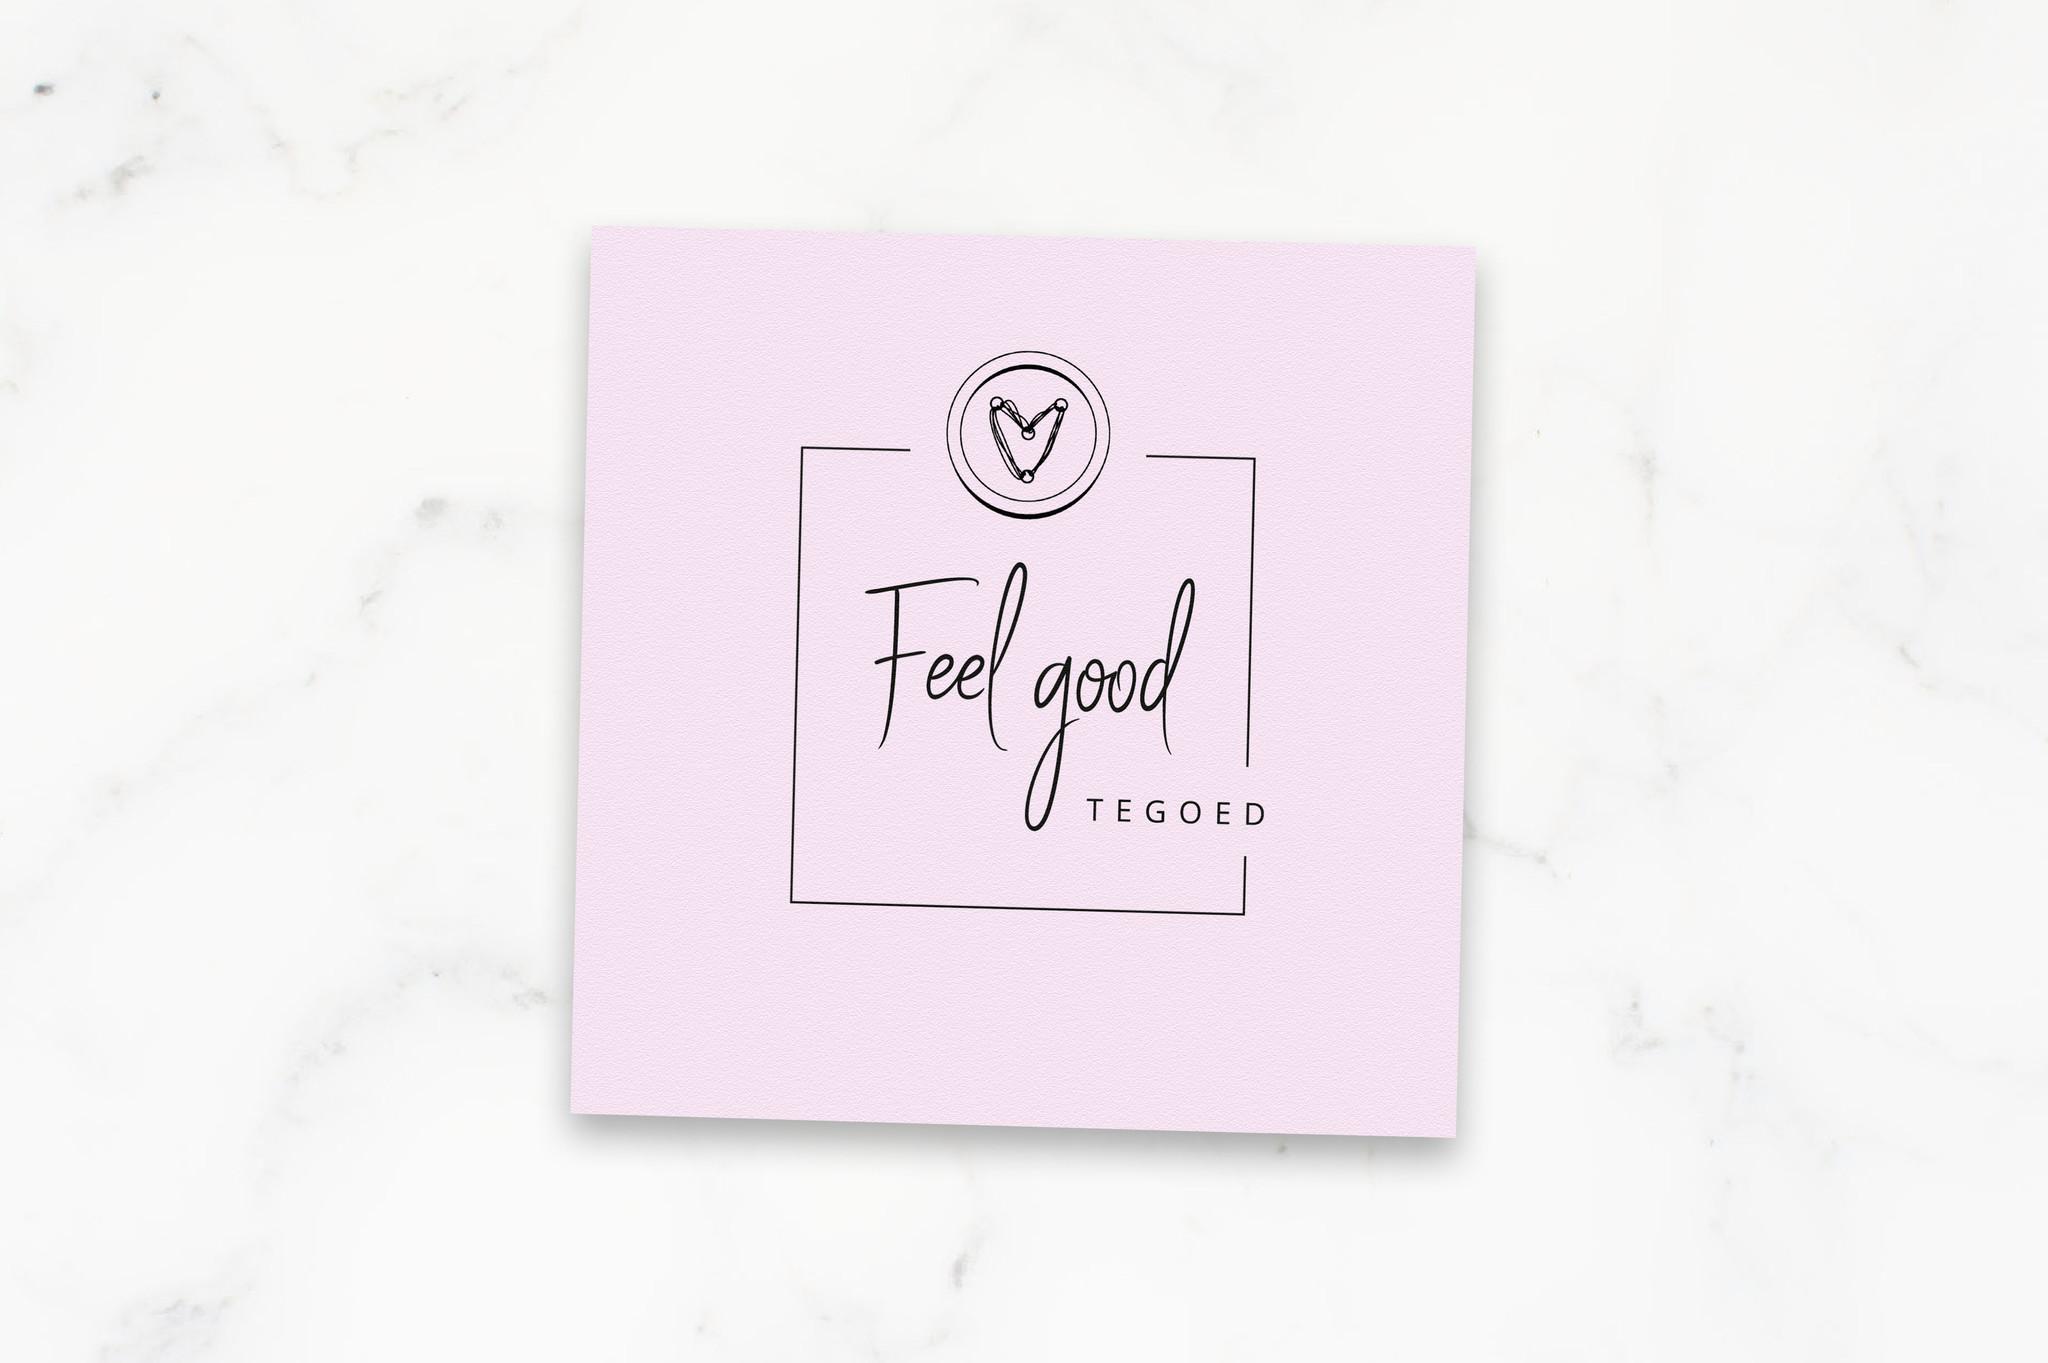 Feel Good Tegoed 'in je mailbox' 15 euro